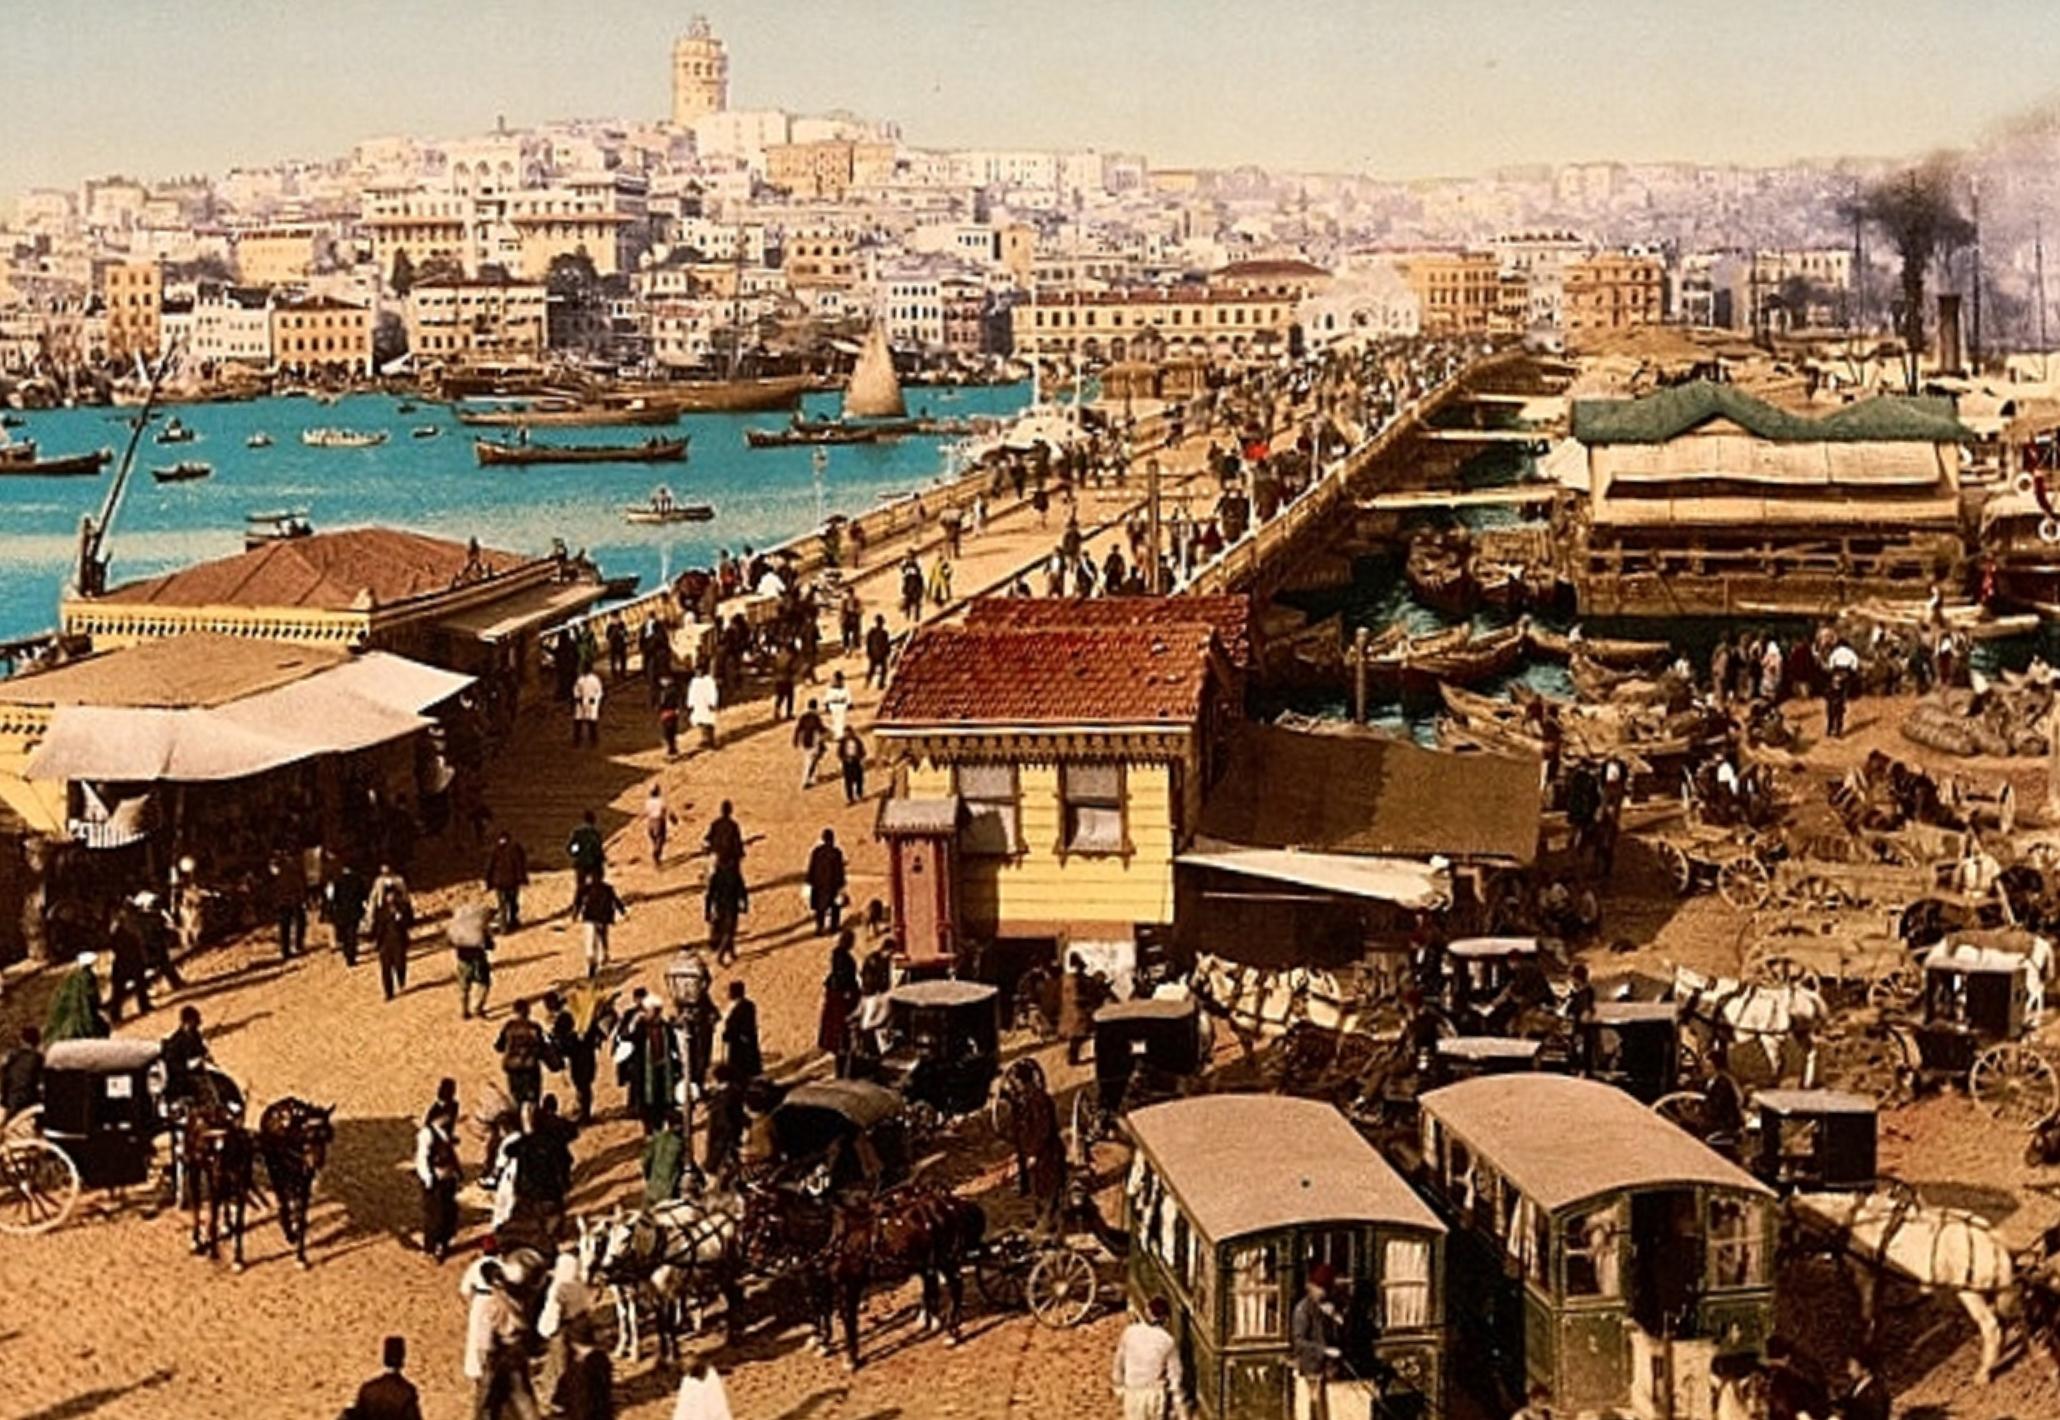 Constantinople 1920s at Galata Bridge